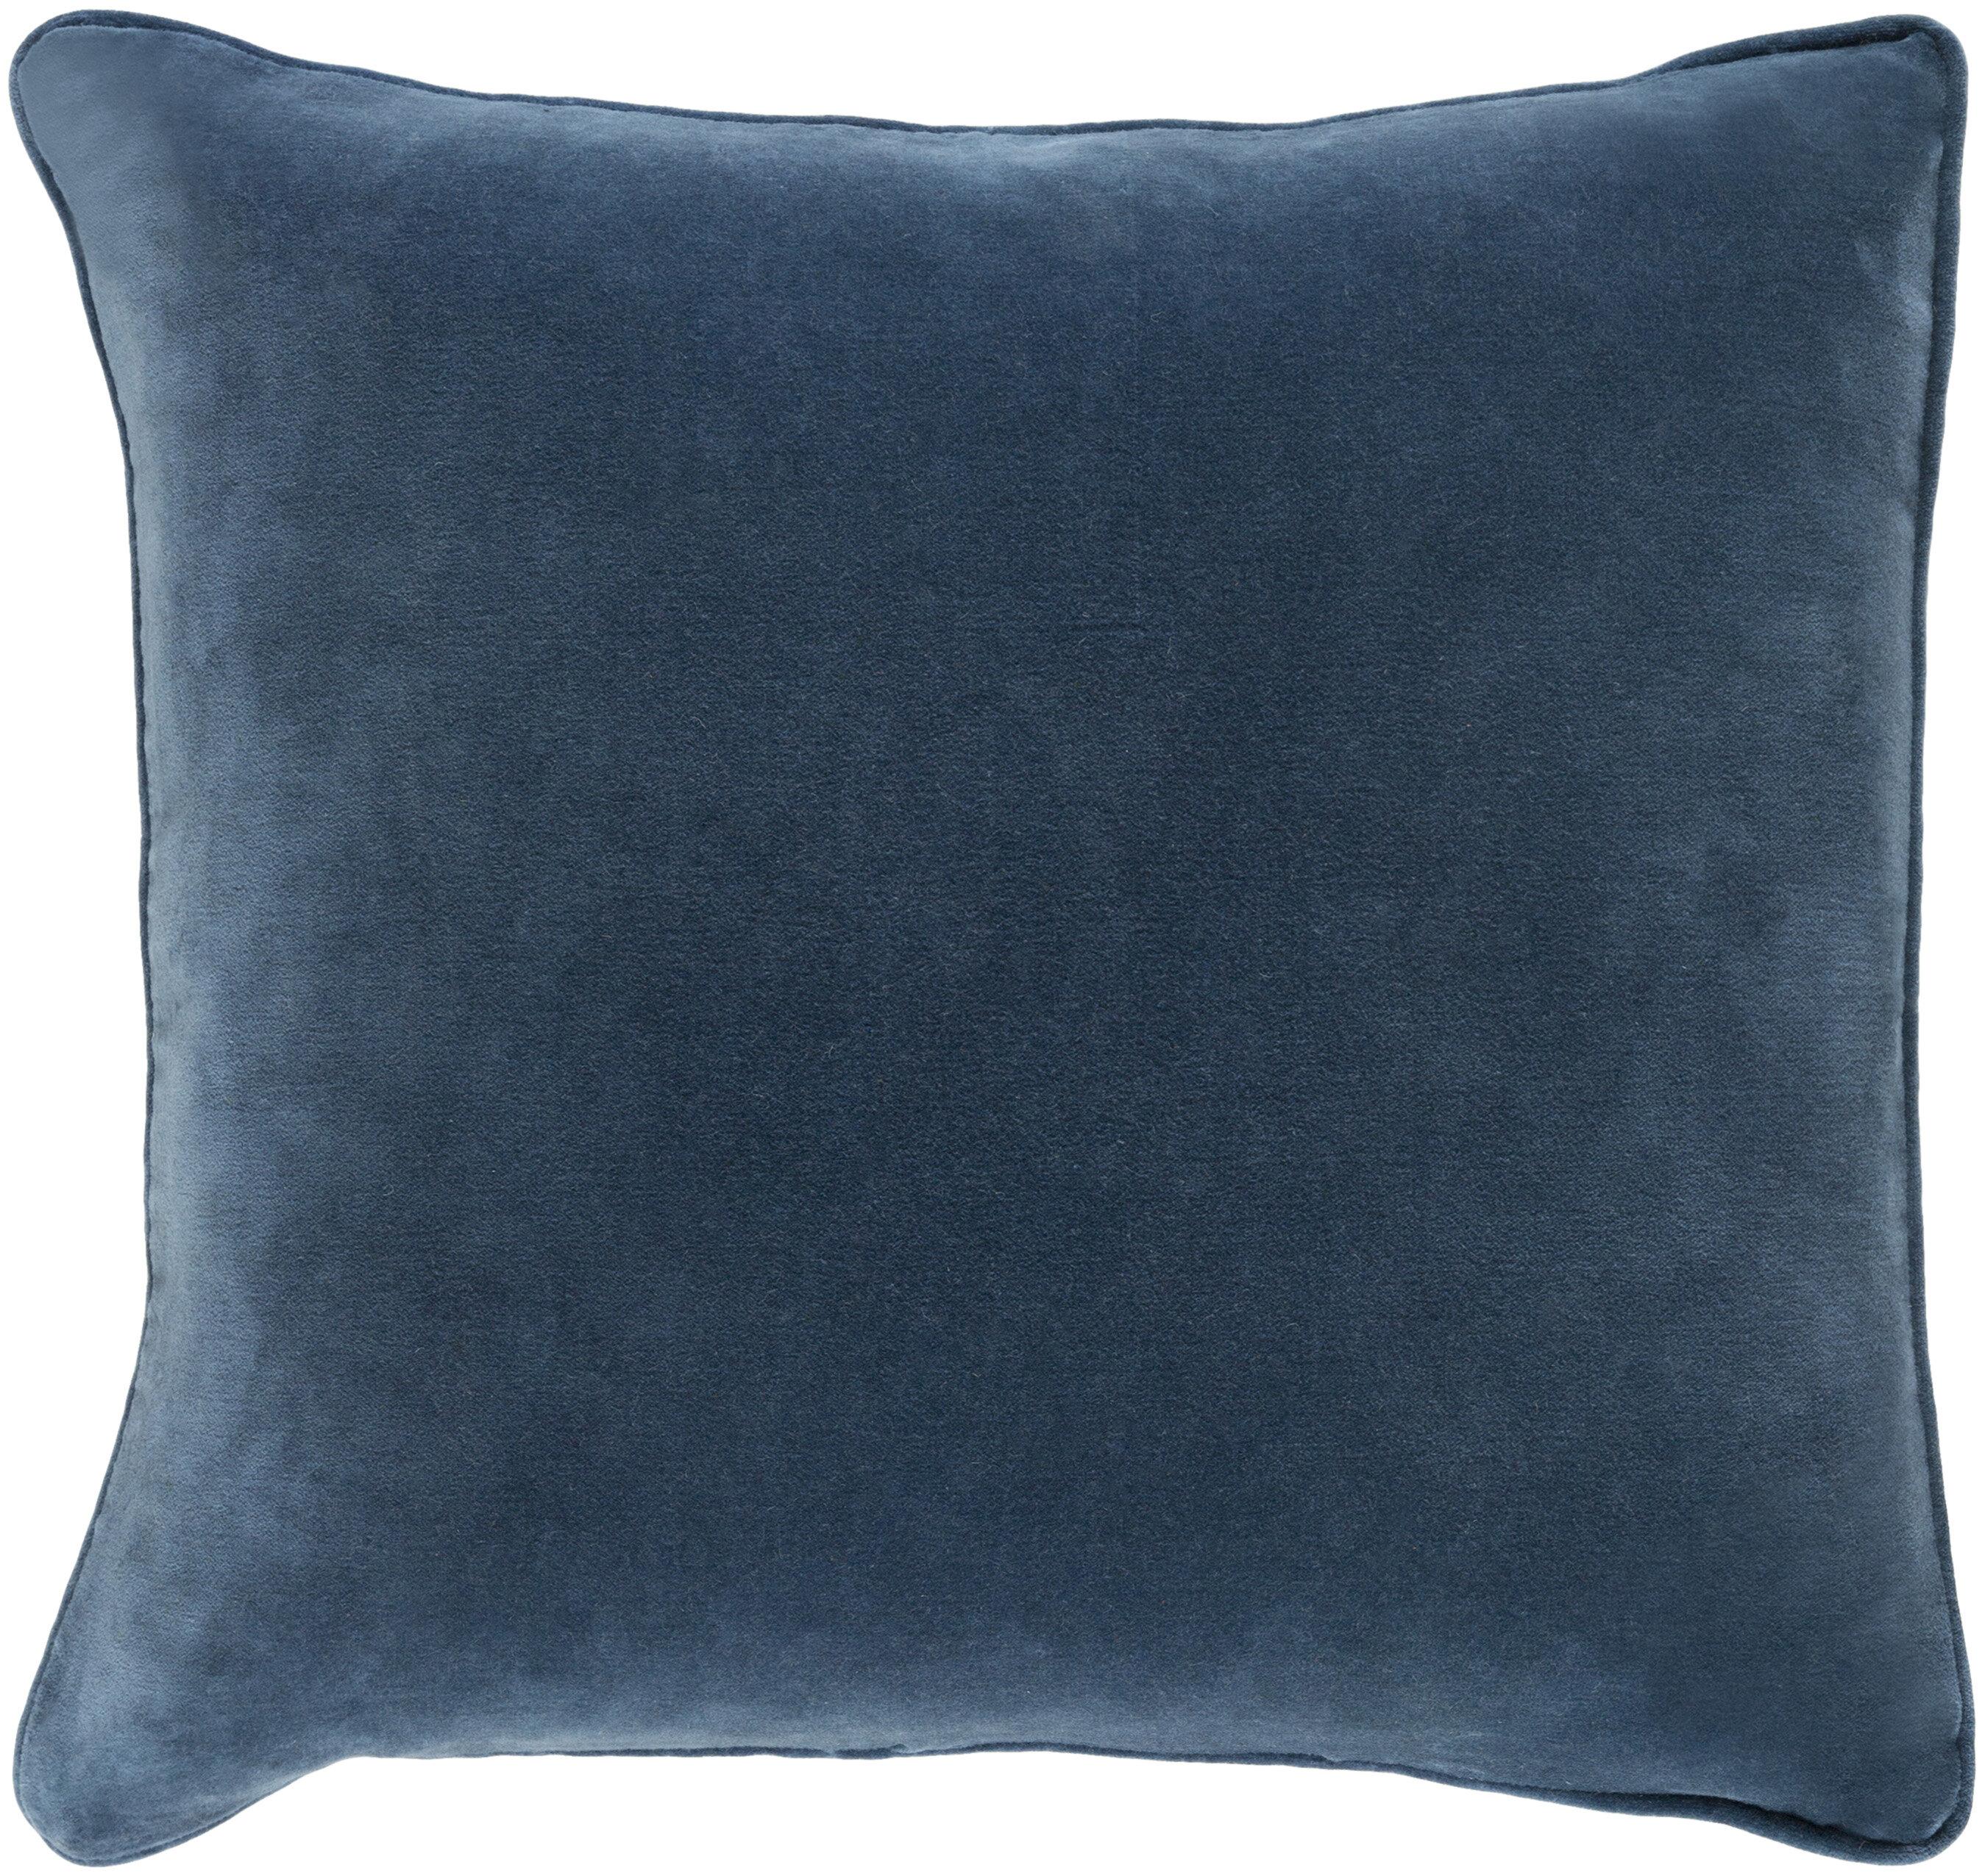 Willa Arlo Interiors Baylie Square Cotton Velvet Pillow Cover ...